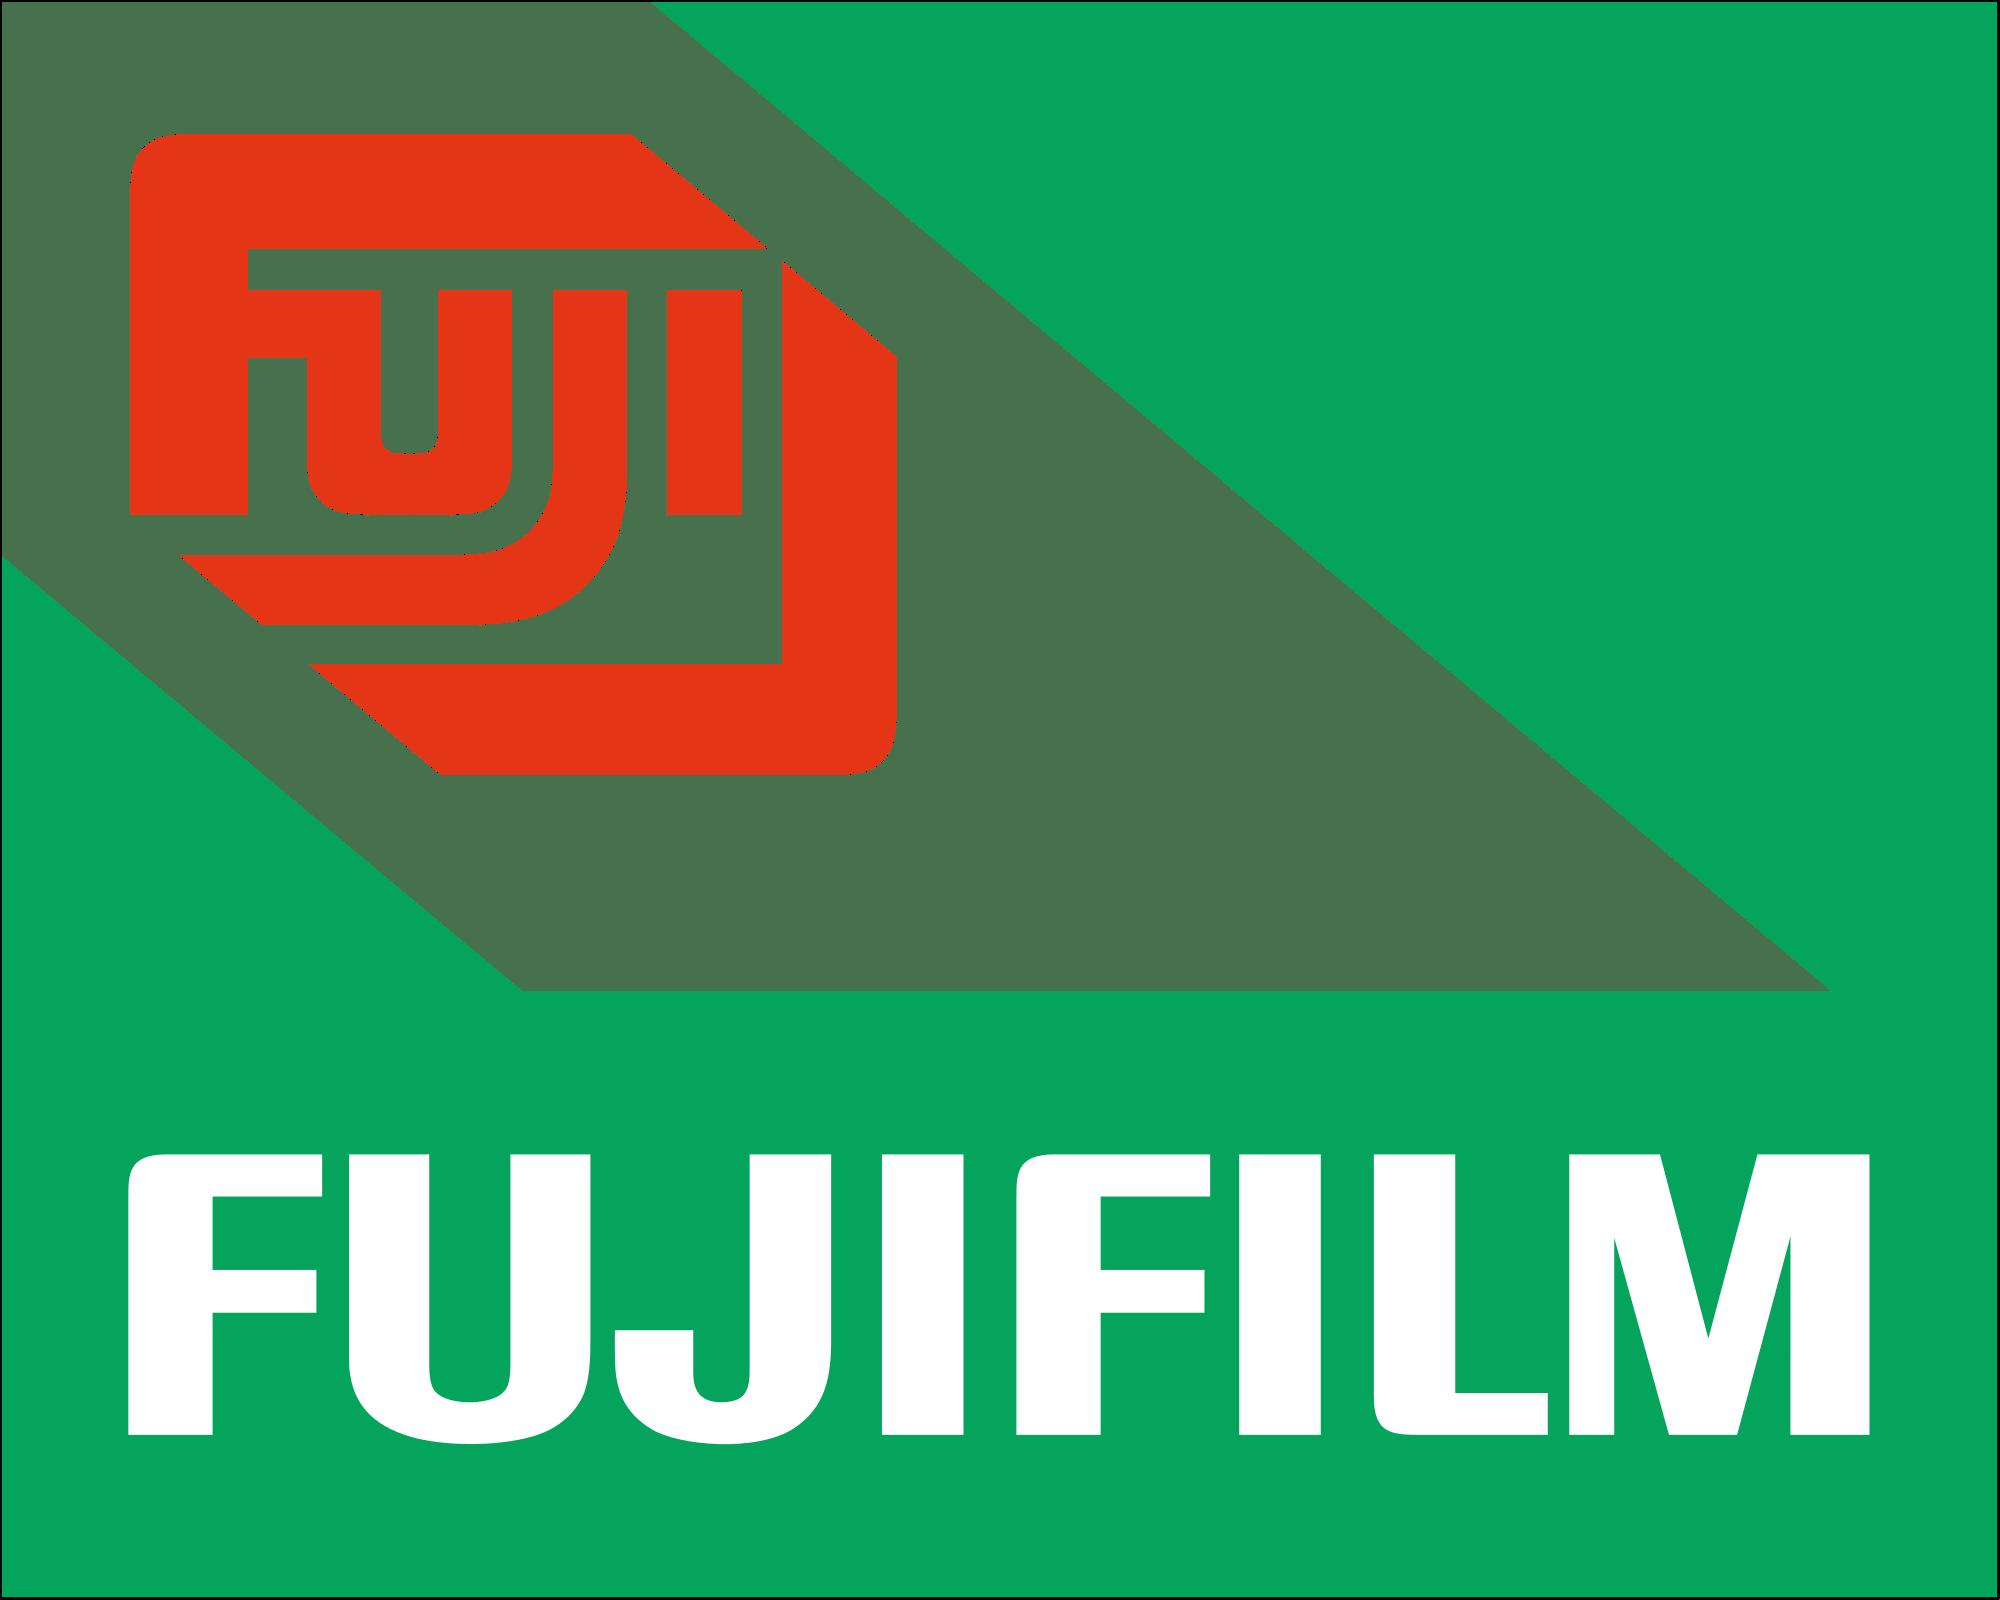 blog_emaygo_fujifilm-uvijet-uv-murekkepleri-nordic-ecolabel-sertifikasyonu-ile-taclandi_4767-min